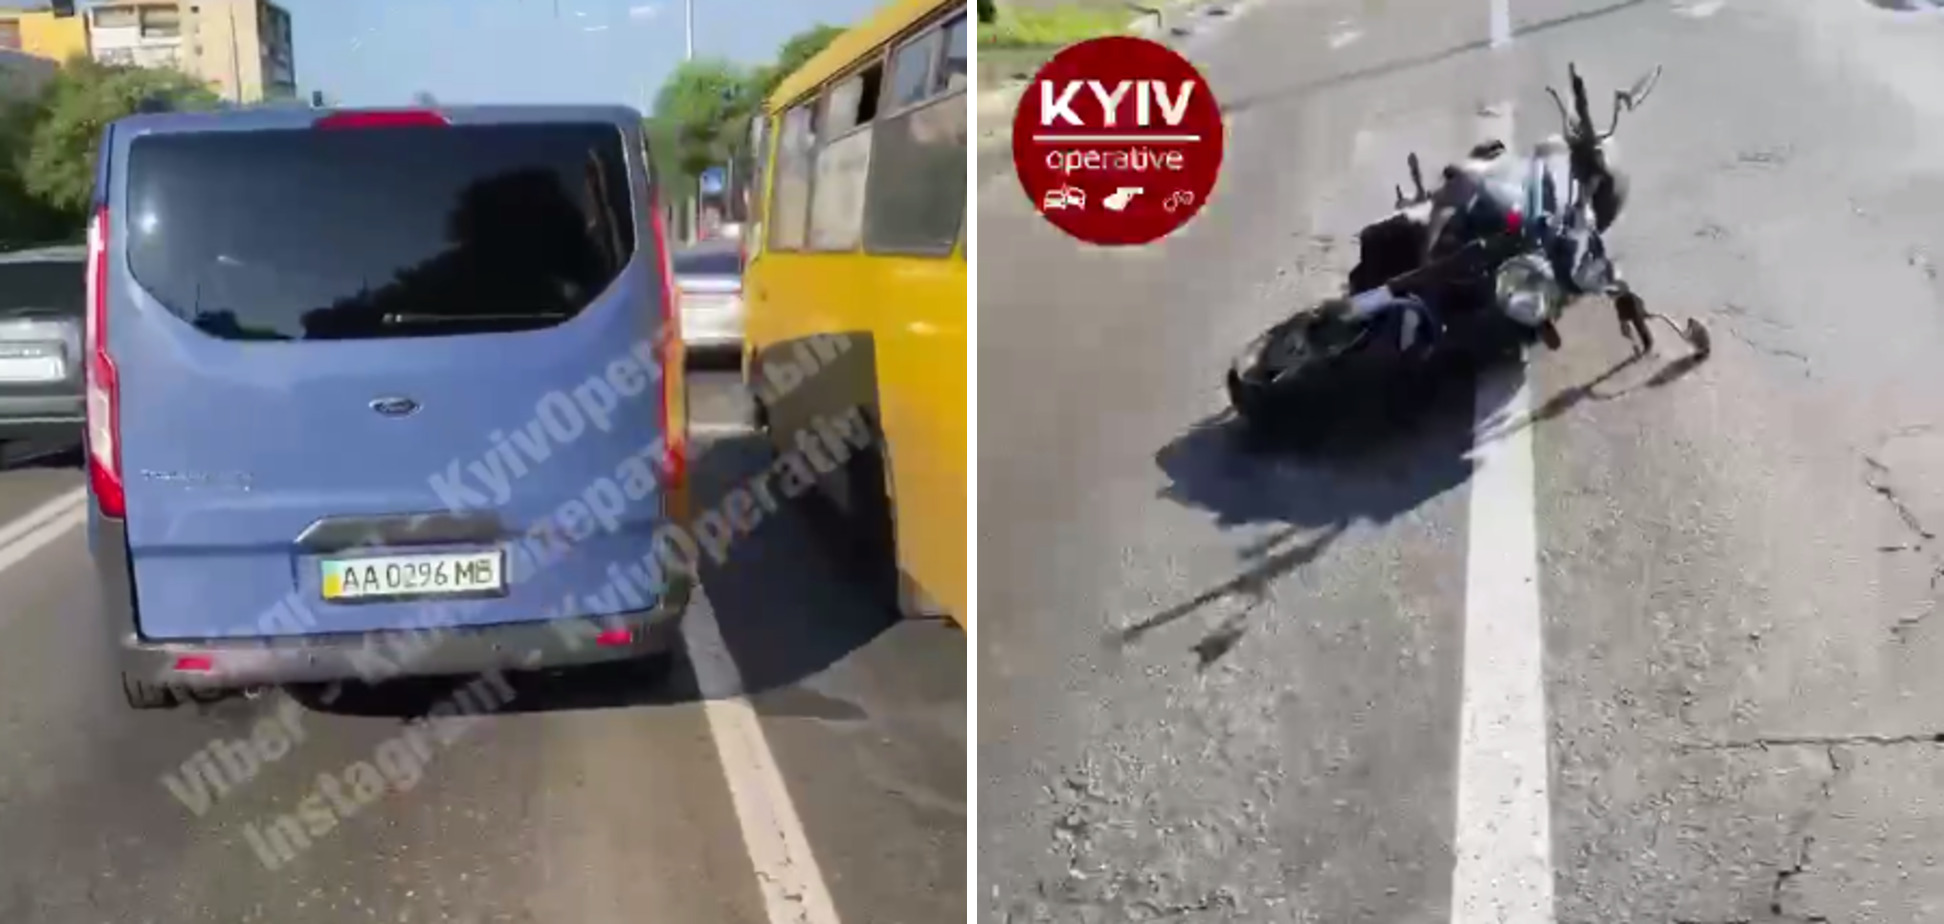 Микроавтобус НАБУ якобы сбил мотоциклиста.